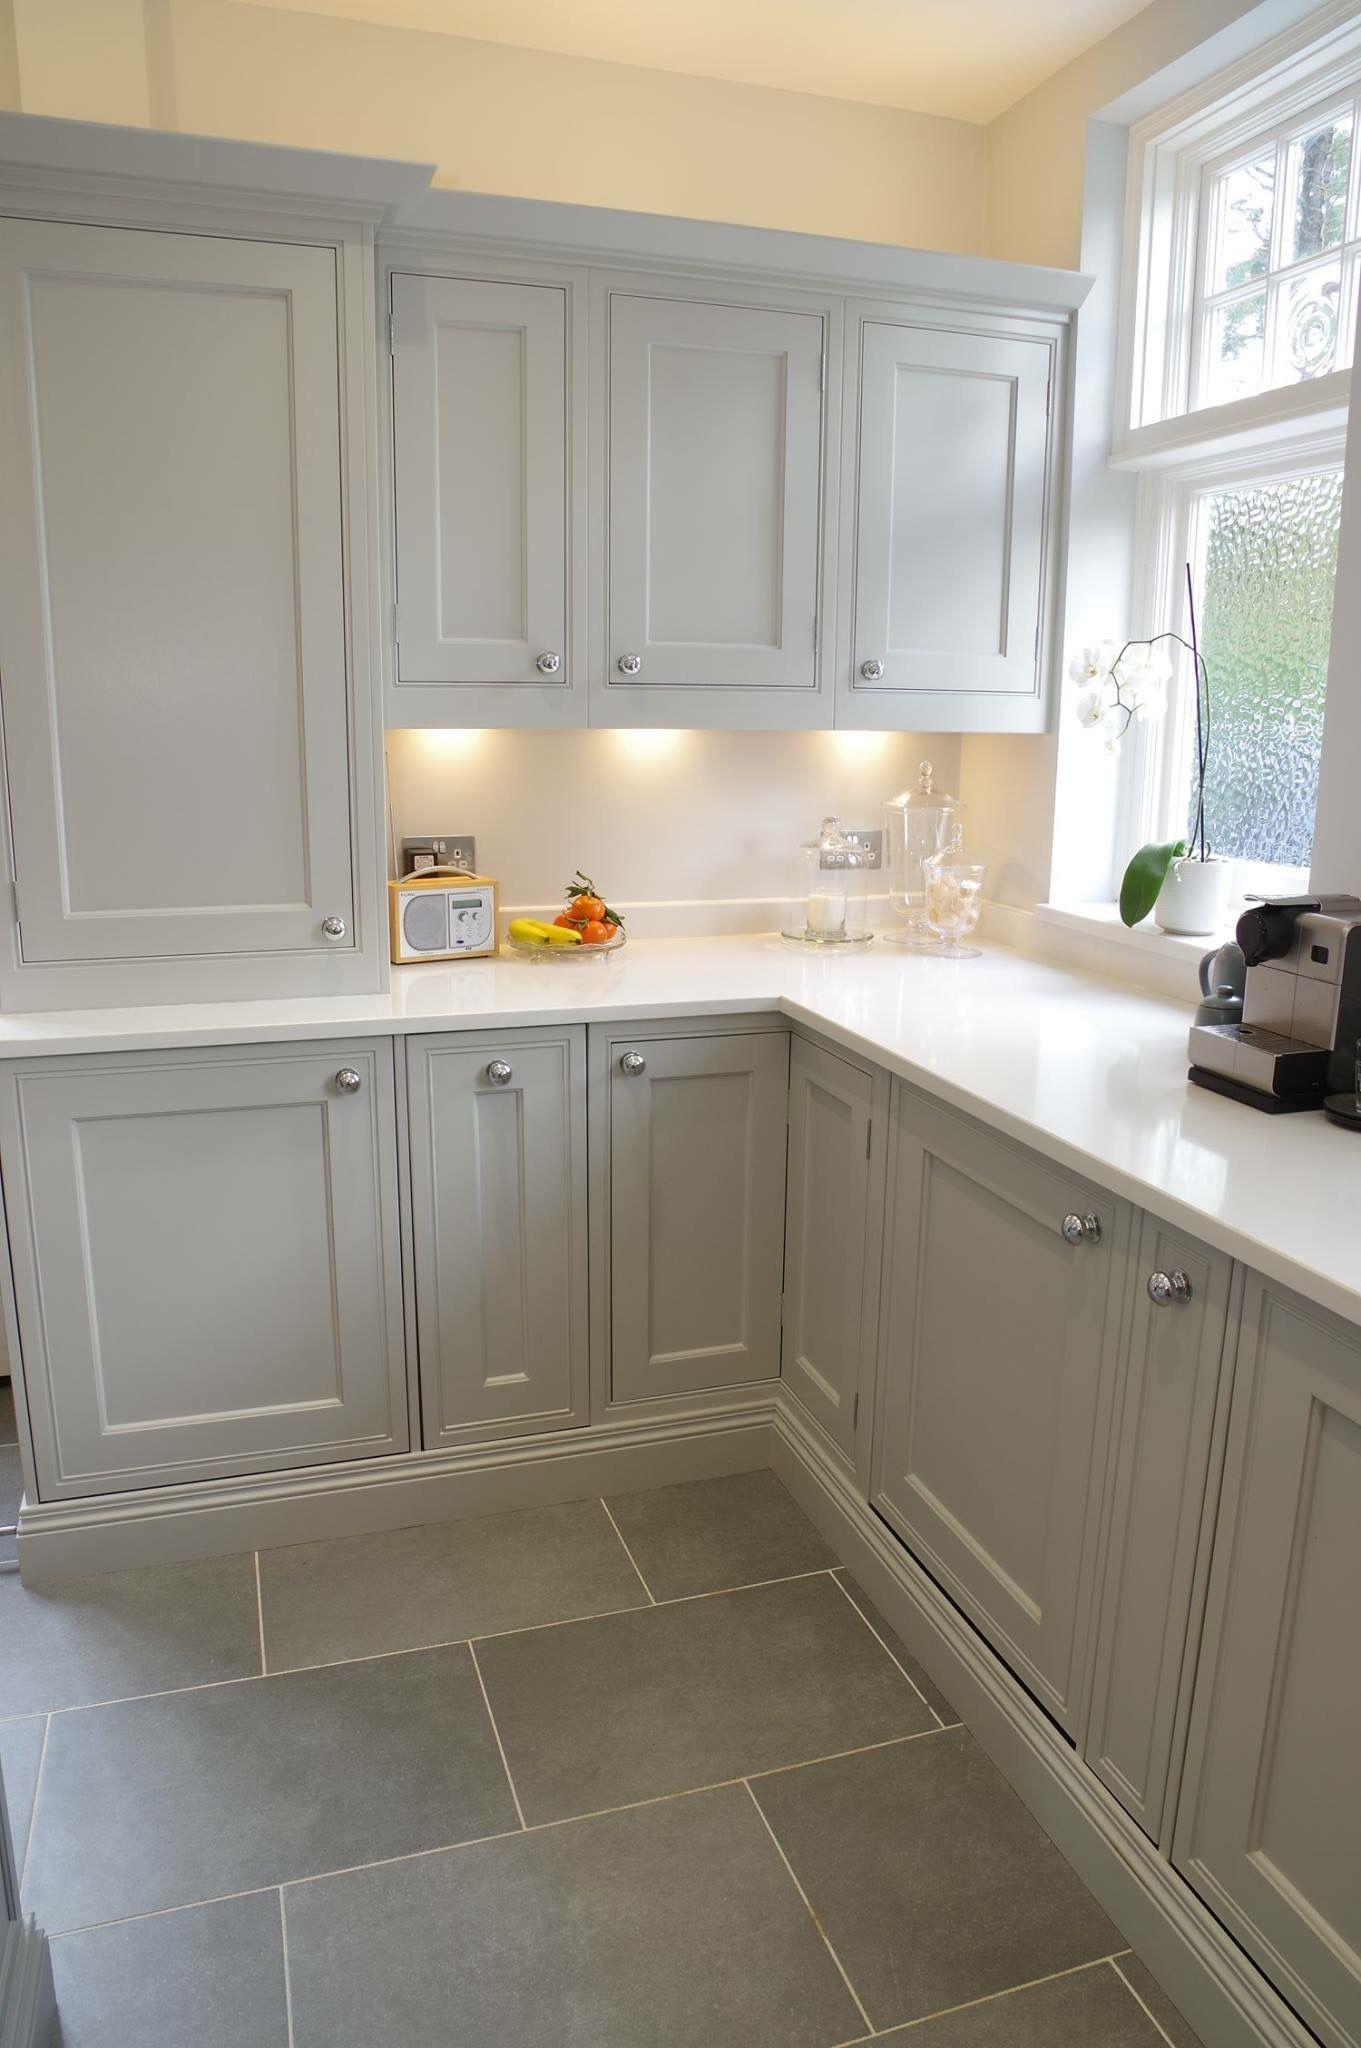 Pin By Theresa Opalka Boorse On Kitchen Kitchen Interior Light Grey Kitchen Cabinets Grey Kitchen Designs